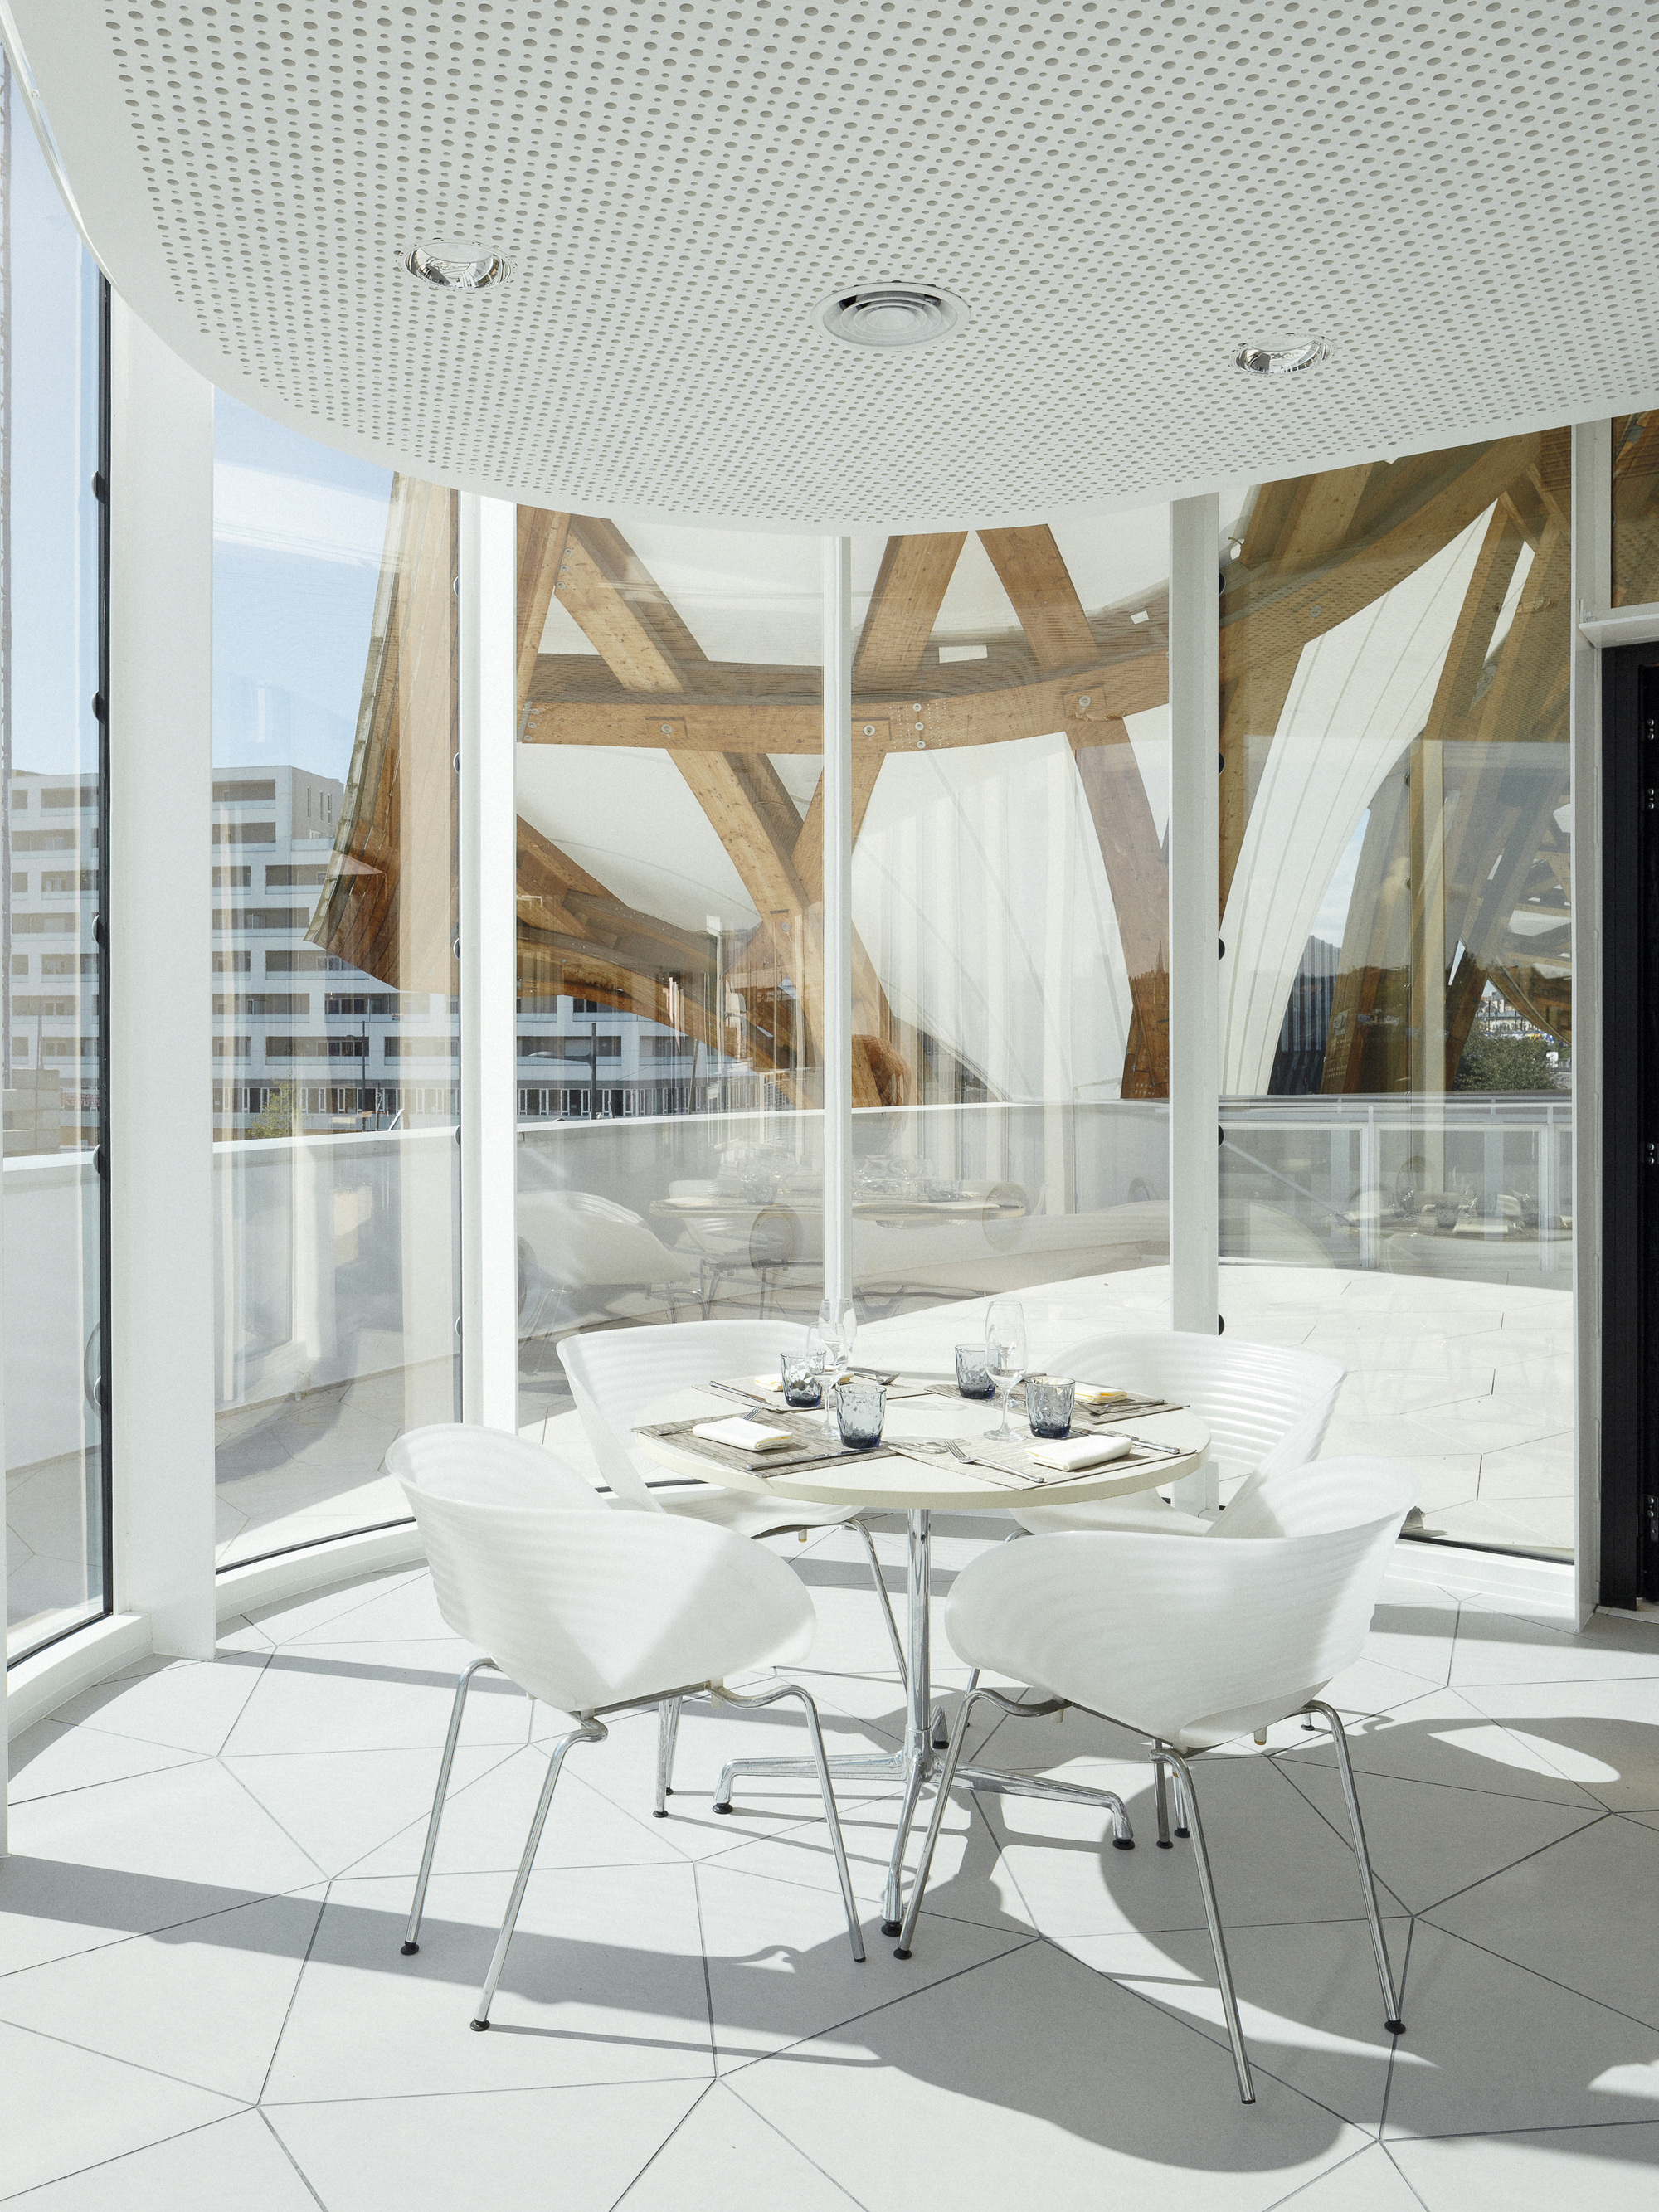 Gallery Of Pompidou Metz Restaurant Extension Studiolada